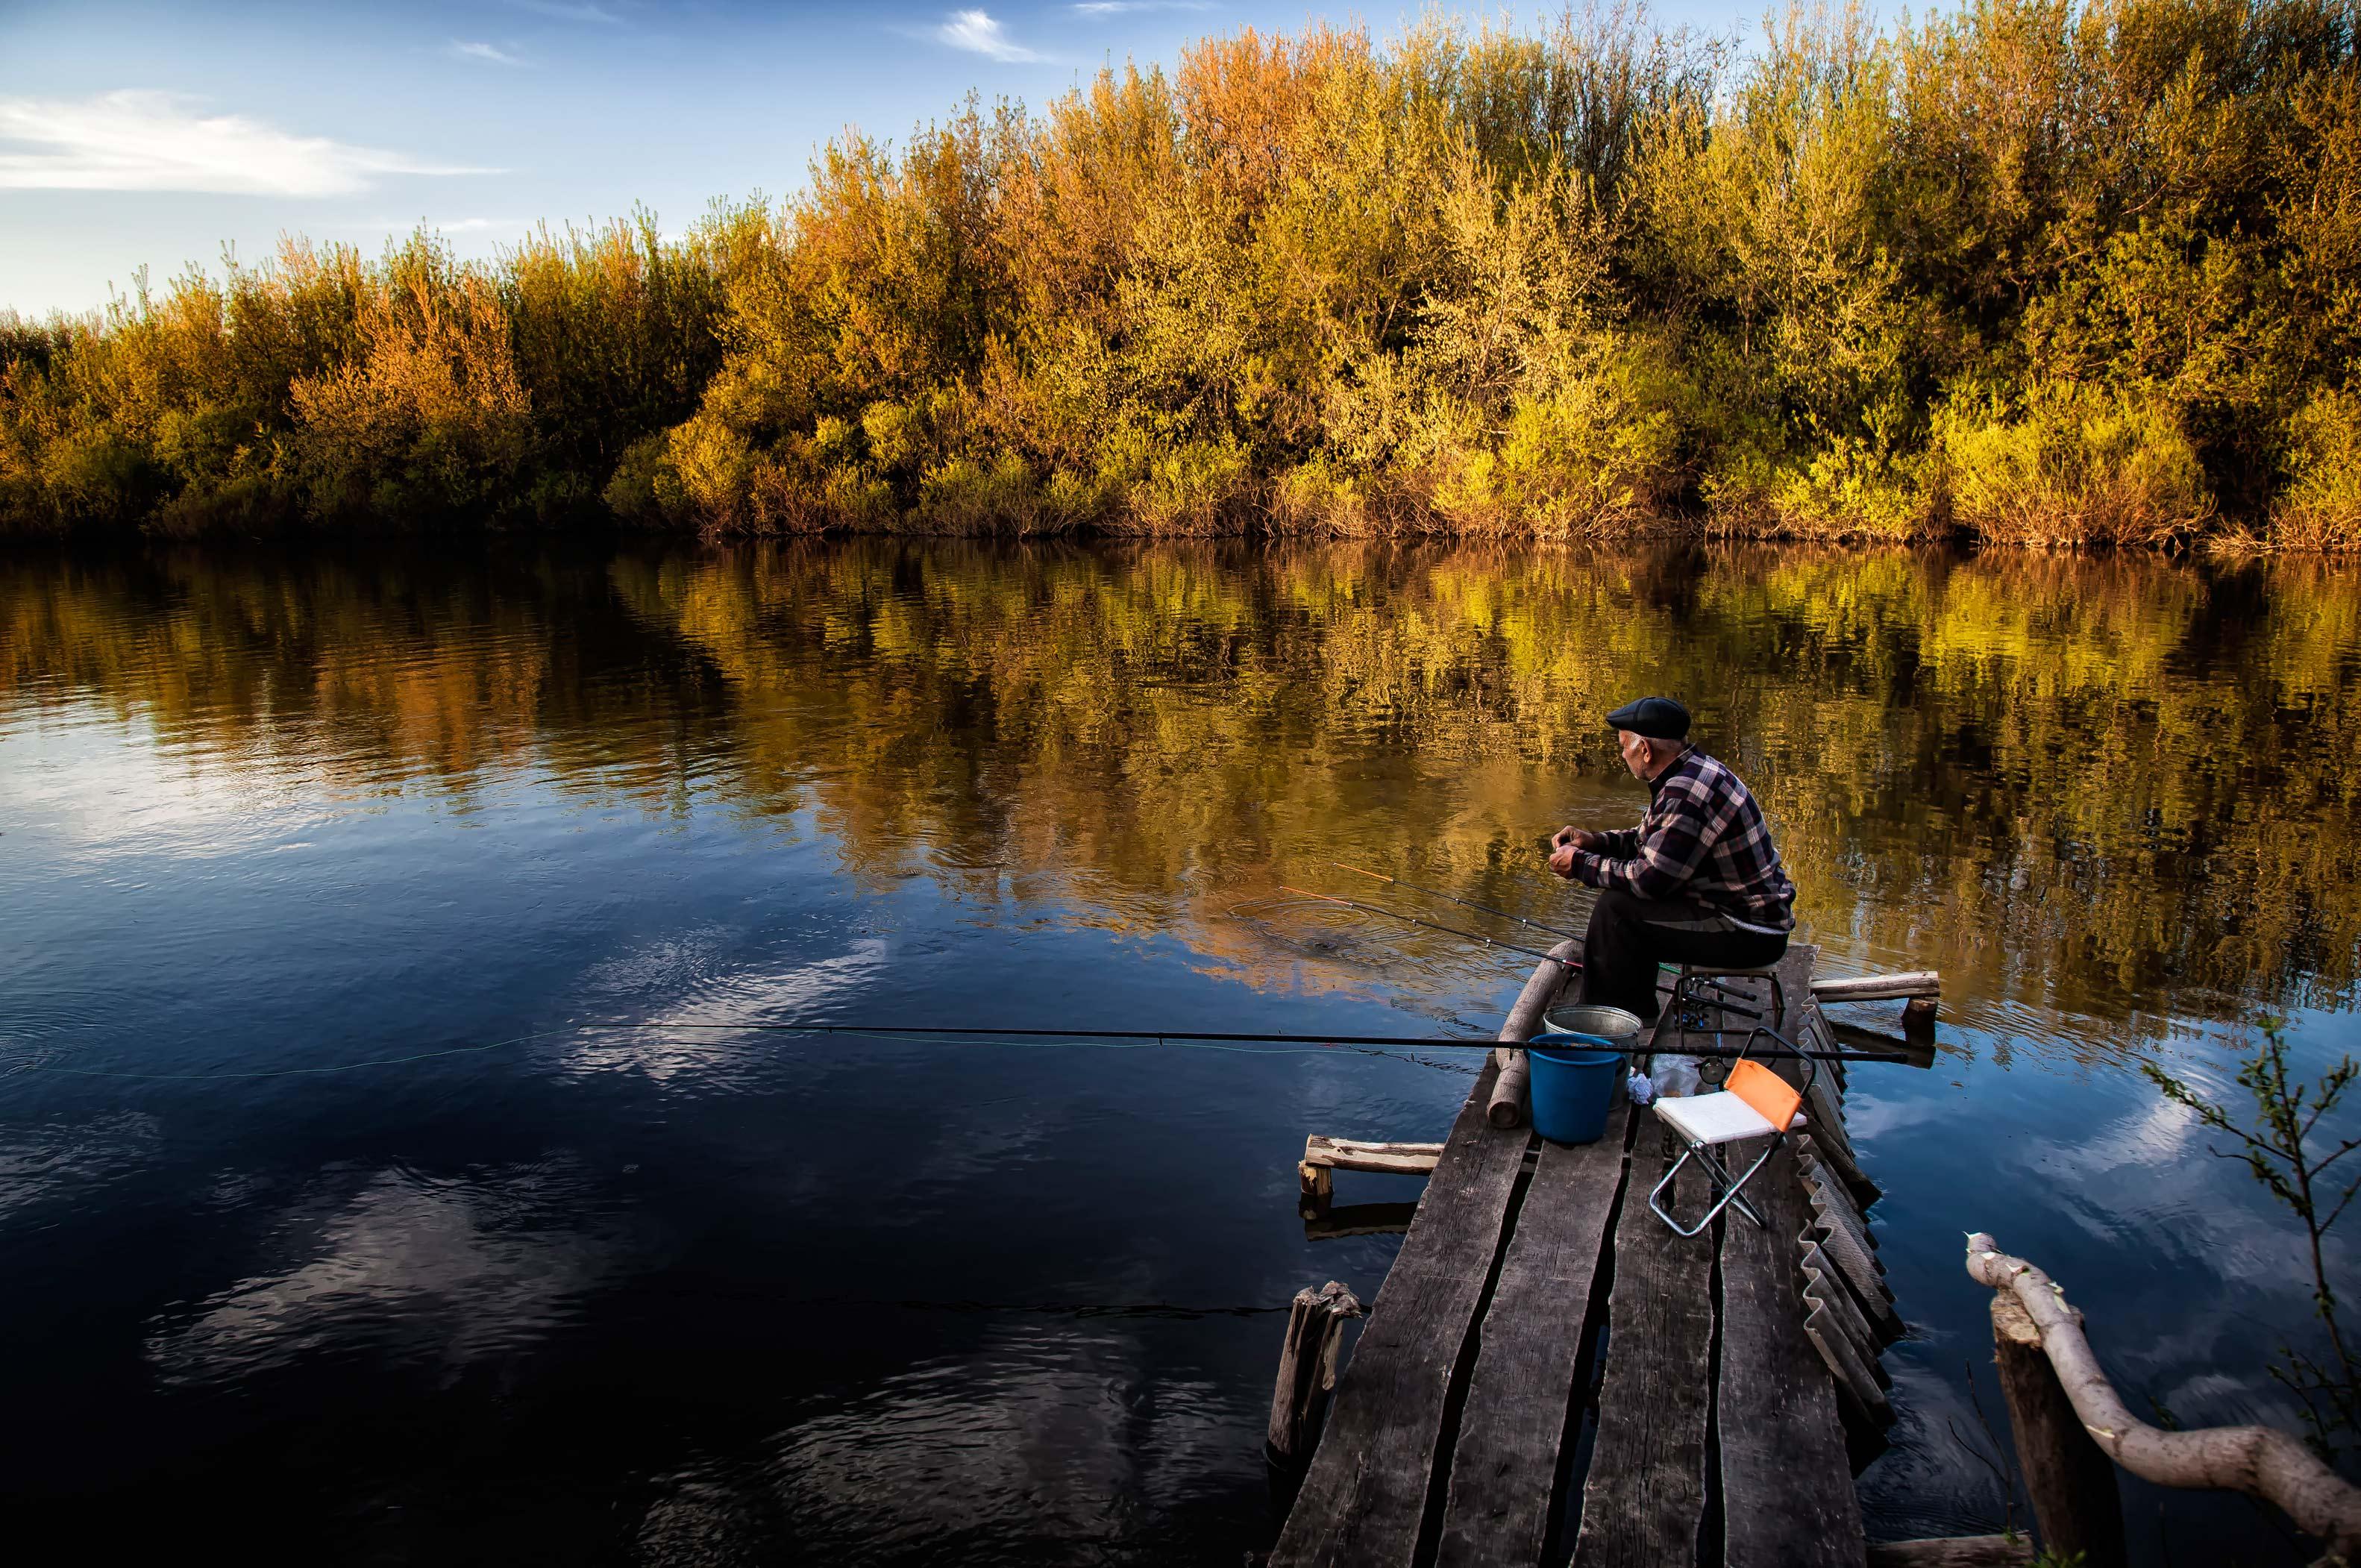 рыбак, река, вечер, башкирия, Дмитрий Уткин